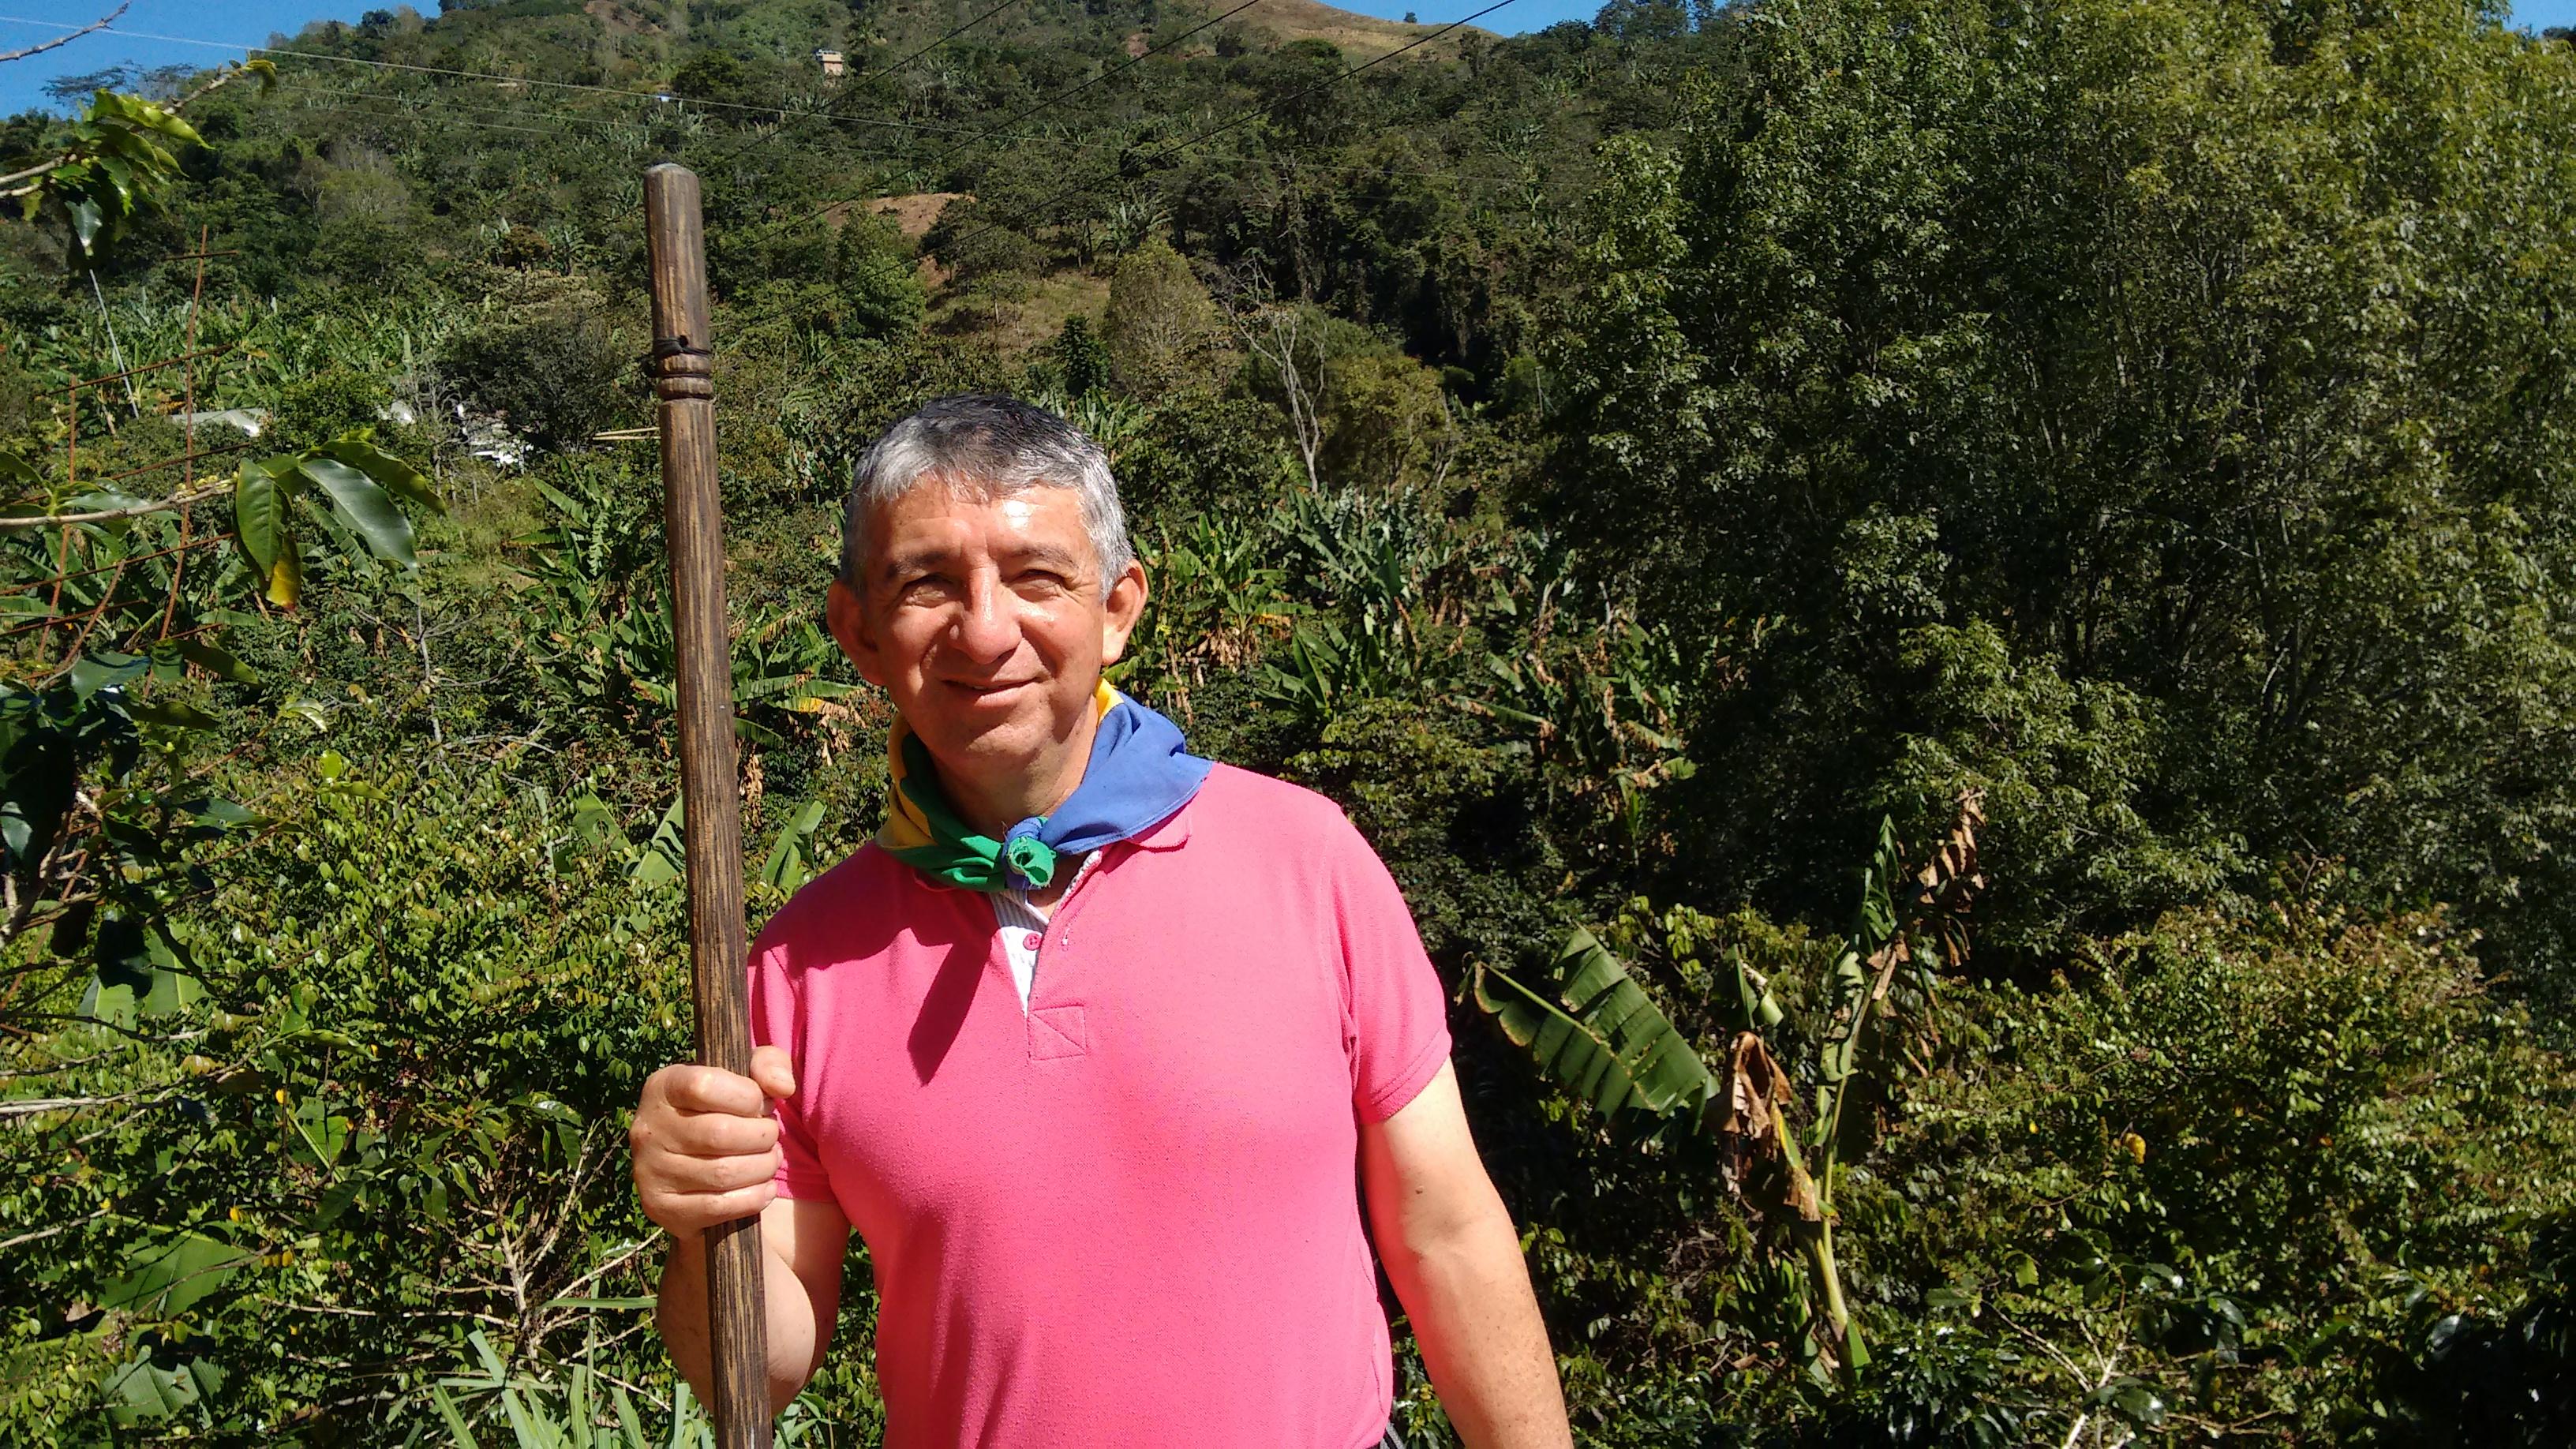 Robert Elio Delgado